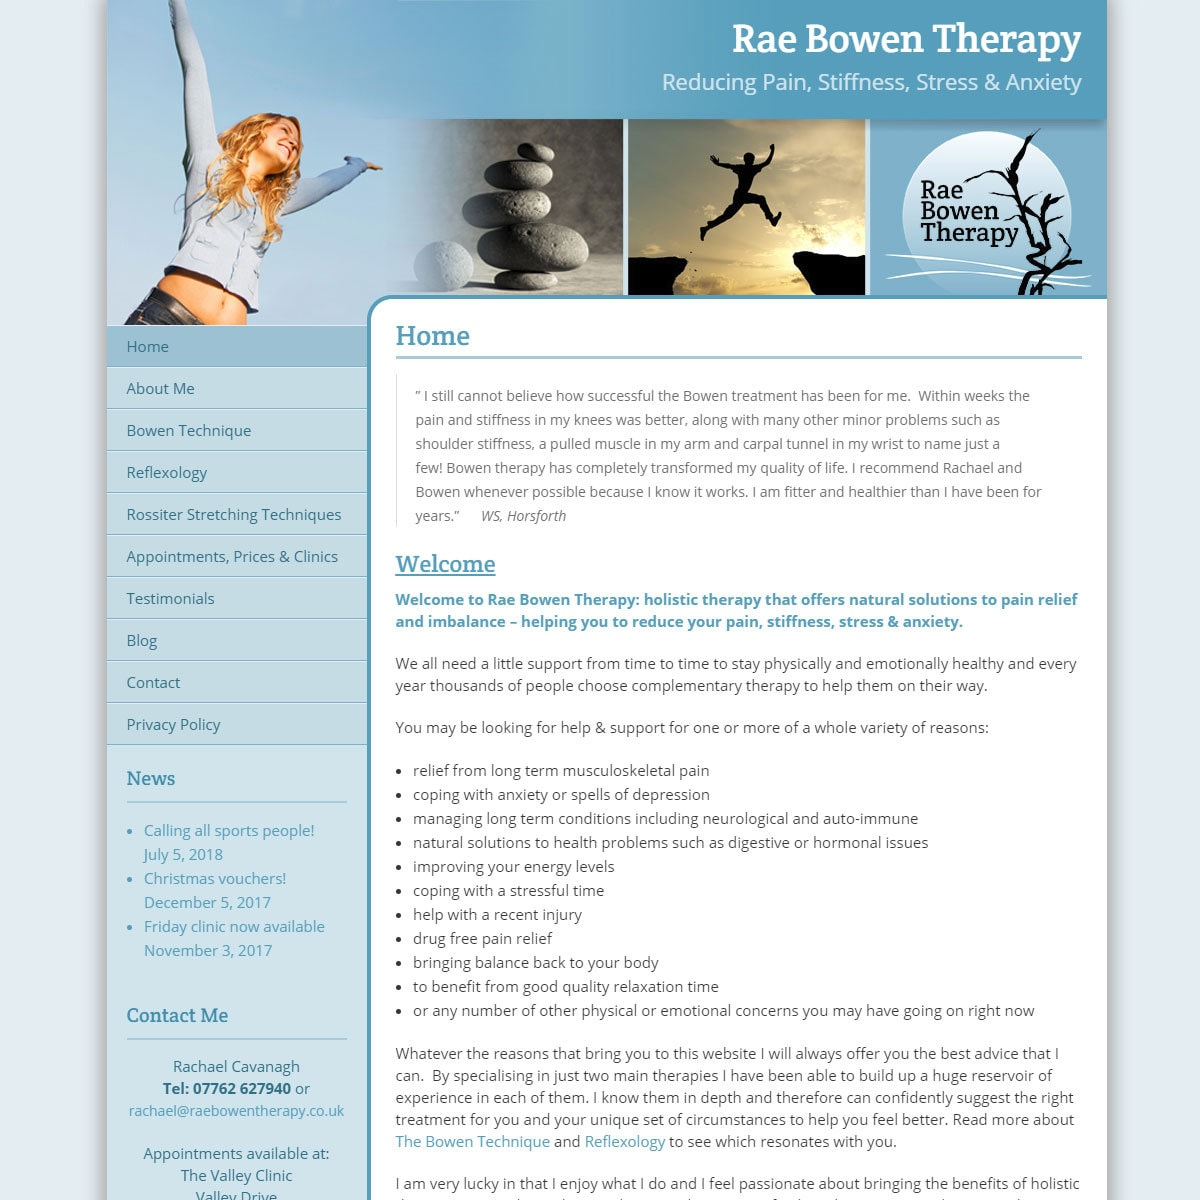 raebowentherapy